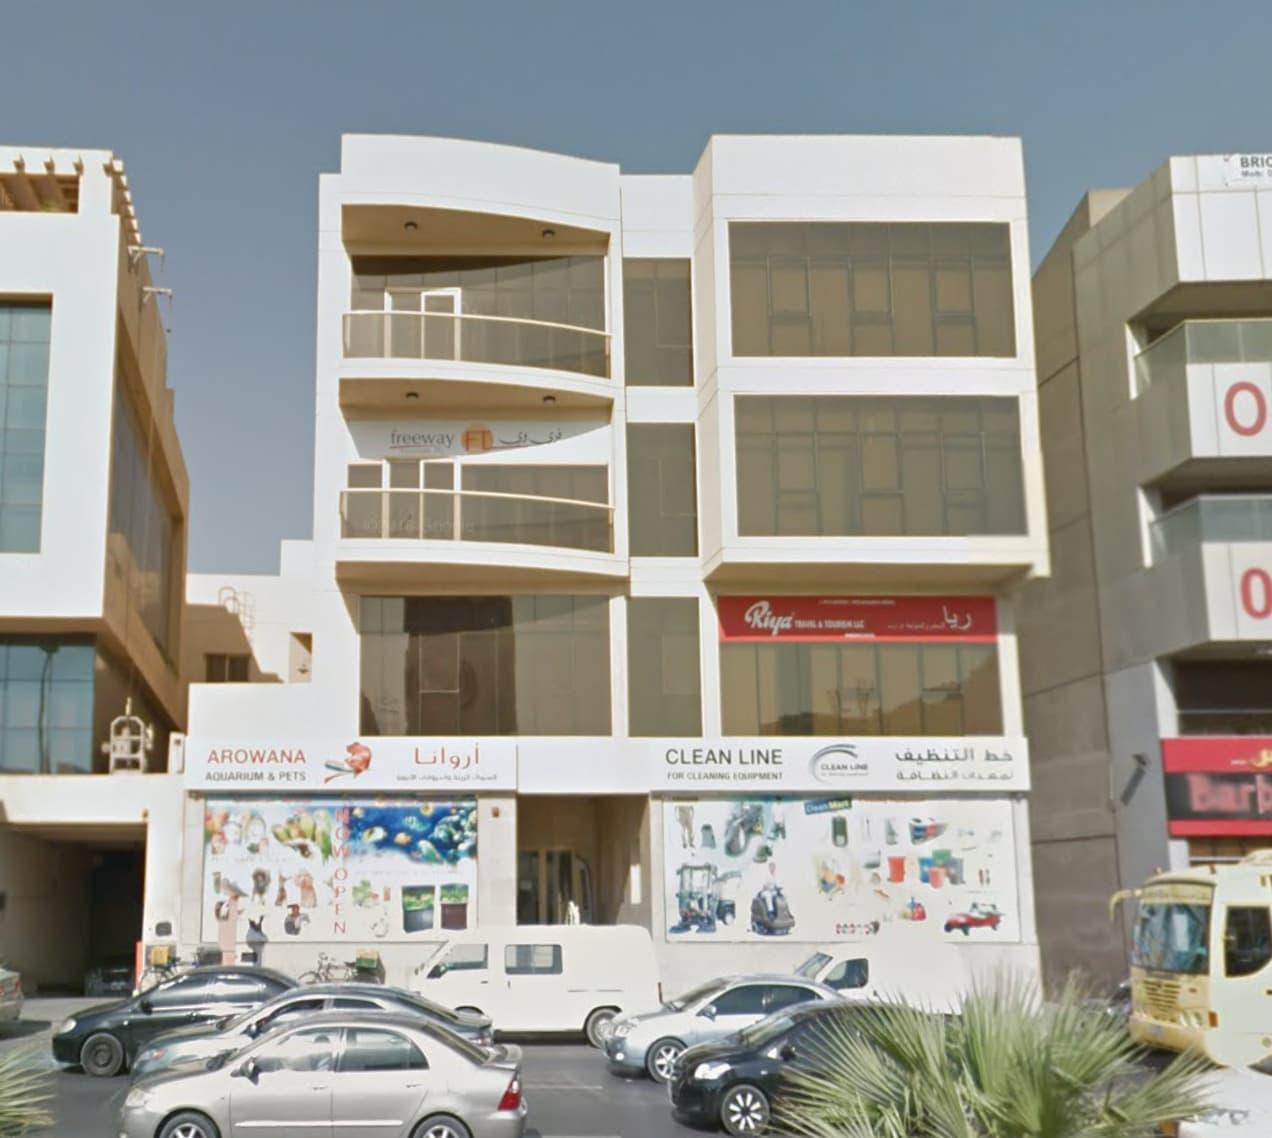 Mixed Use Building in Al Khabisi, Dubai | ProTenders